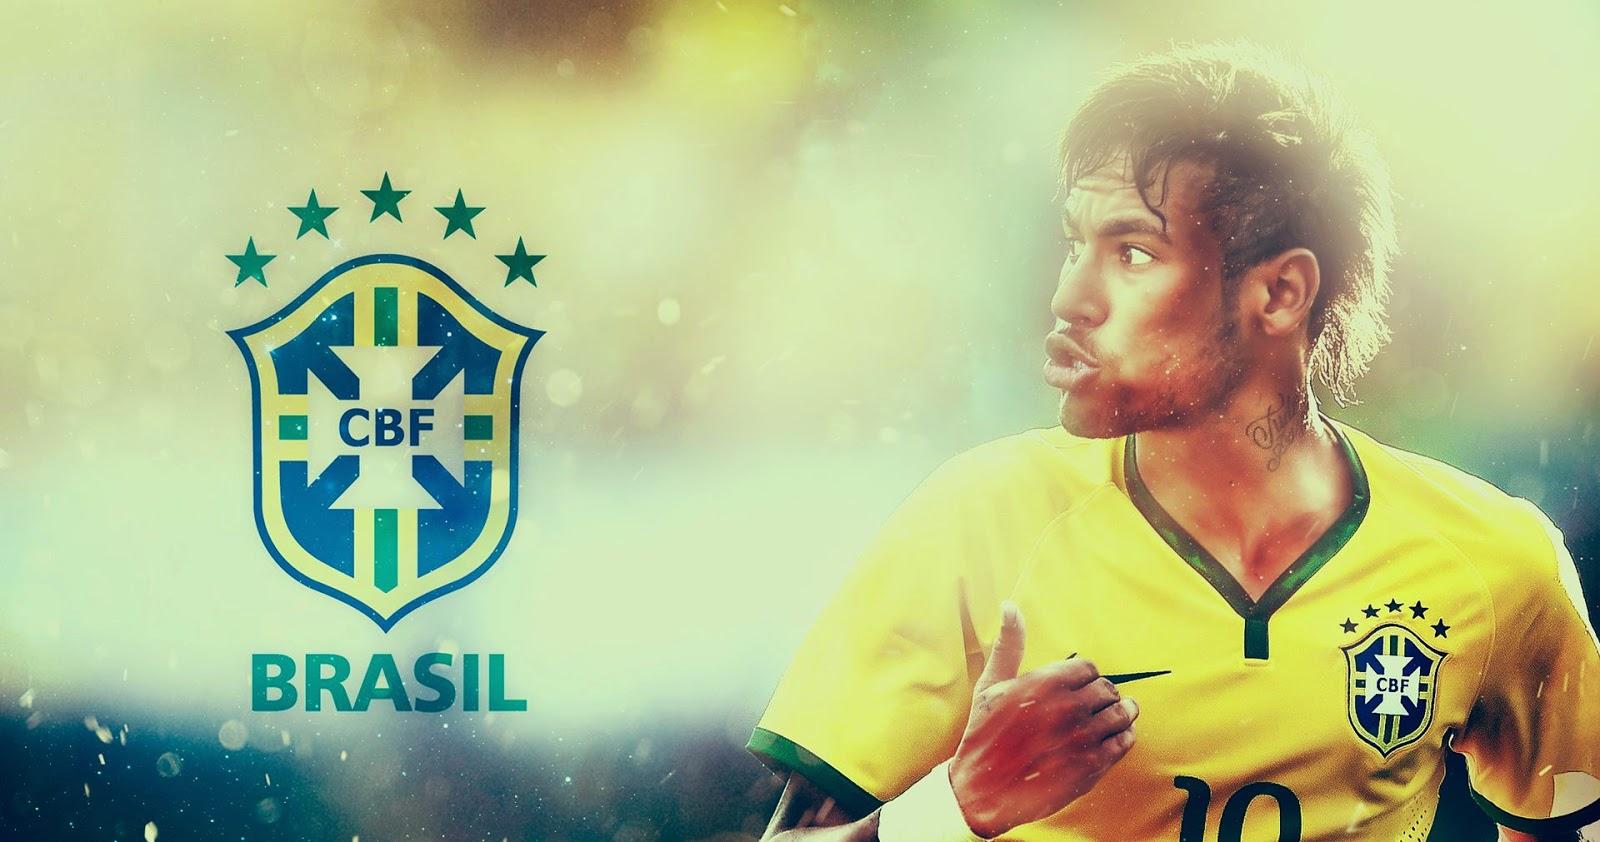 Kumpulan Foto Lucu Neymar Kantor Meme